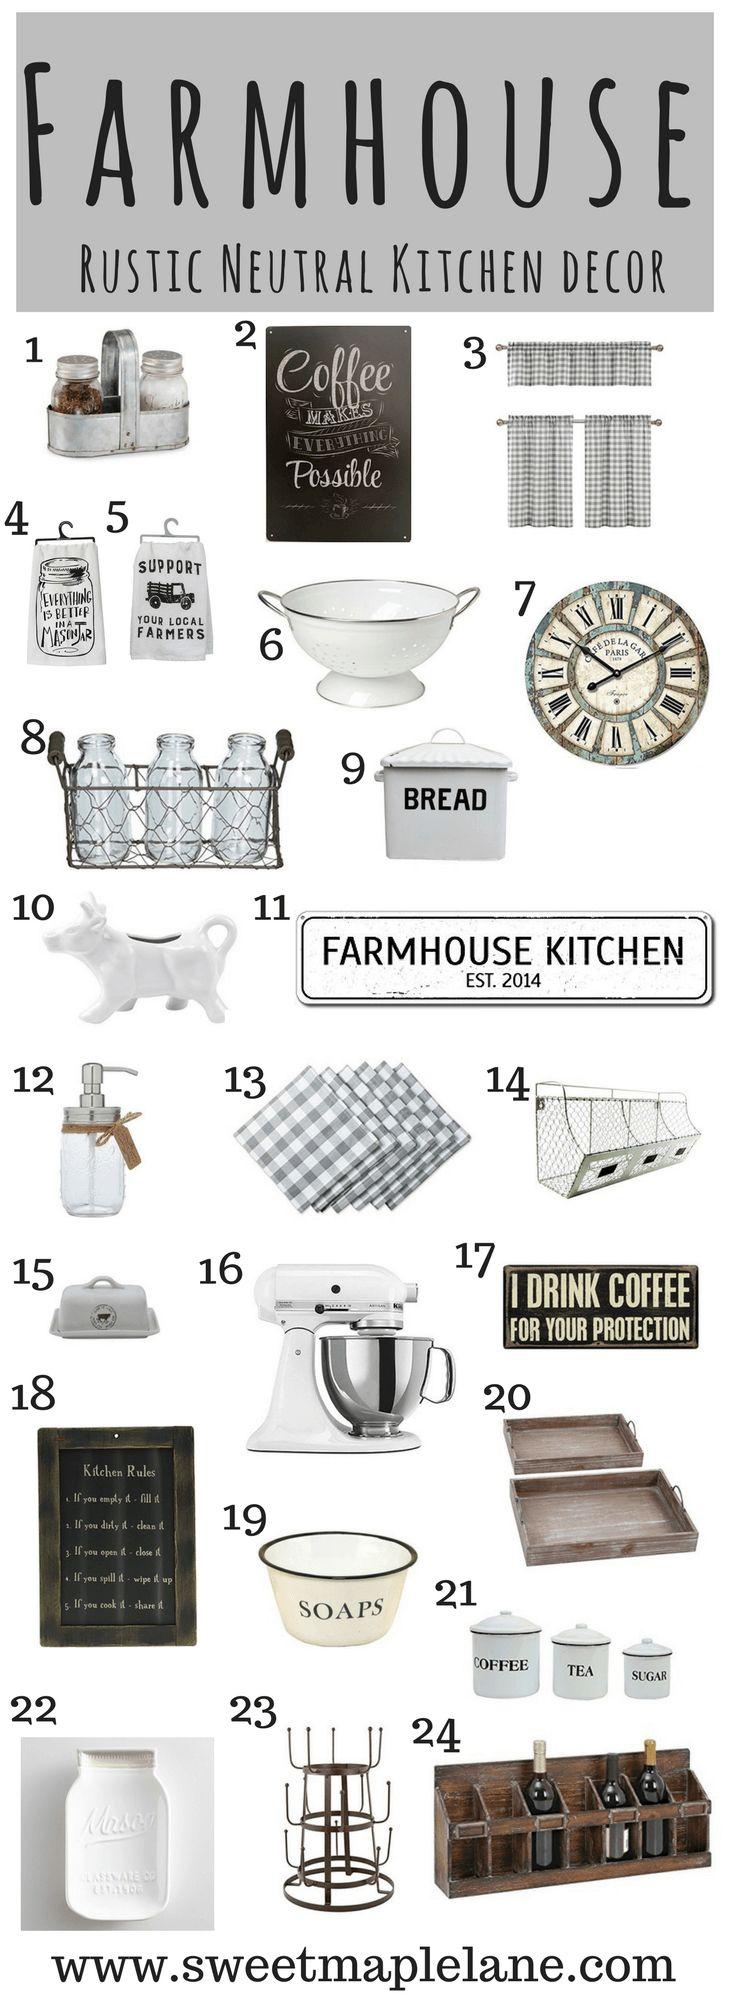 The ultimate list of rustic neutral farmhouse kitchen decor!